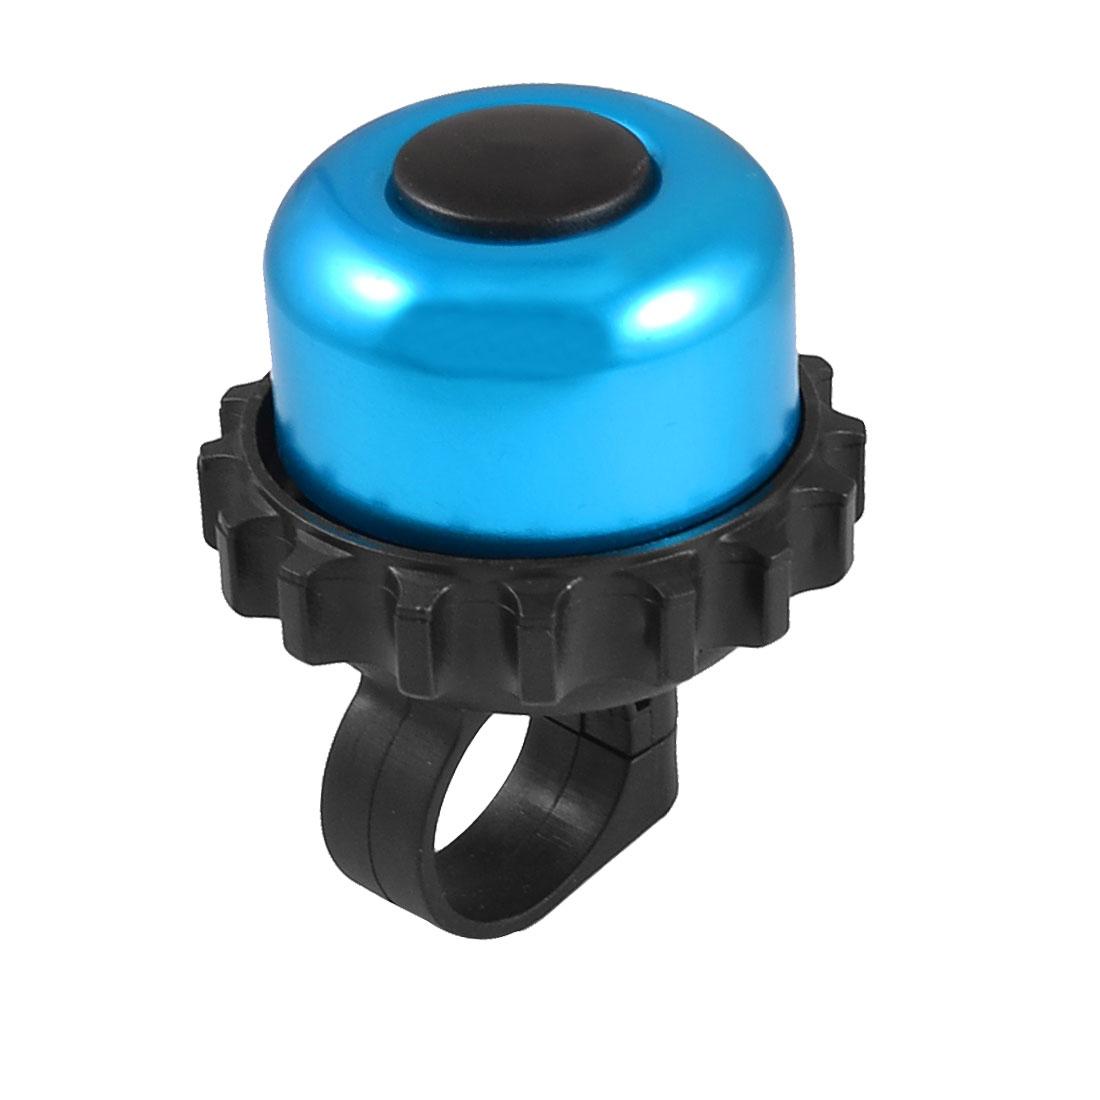 Cyan Black Bike Bicycle Rotatable Warning Bell for 22mm Dia Handlebar